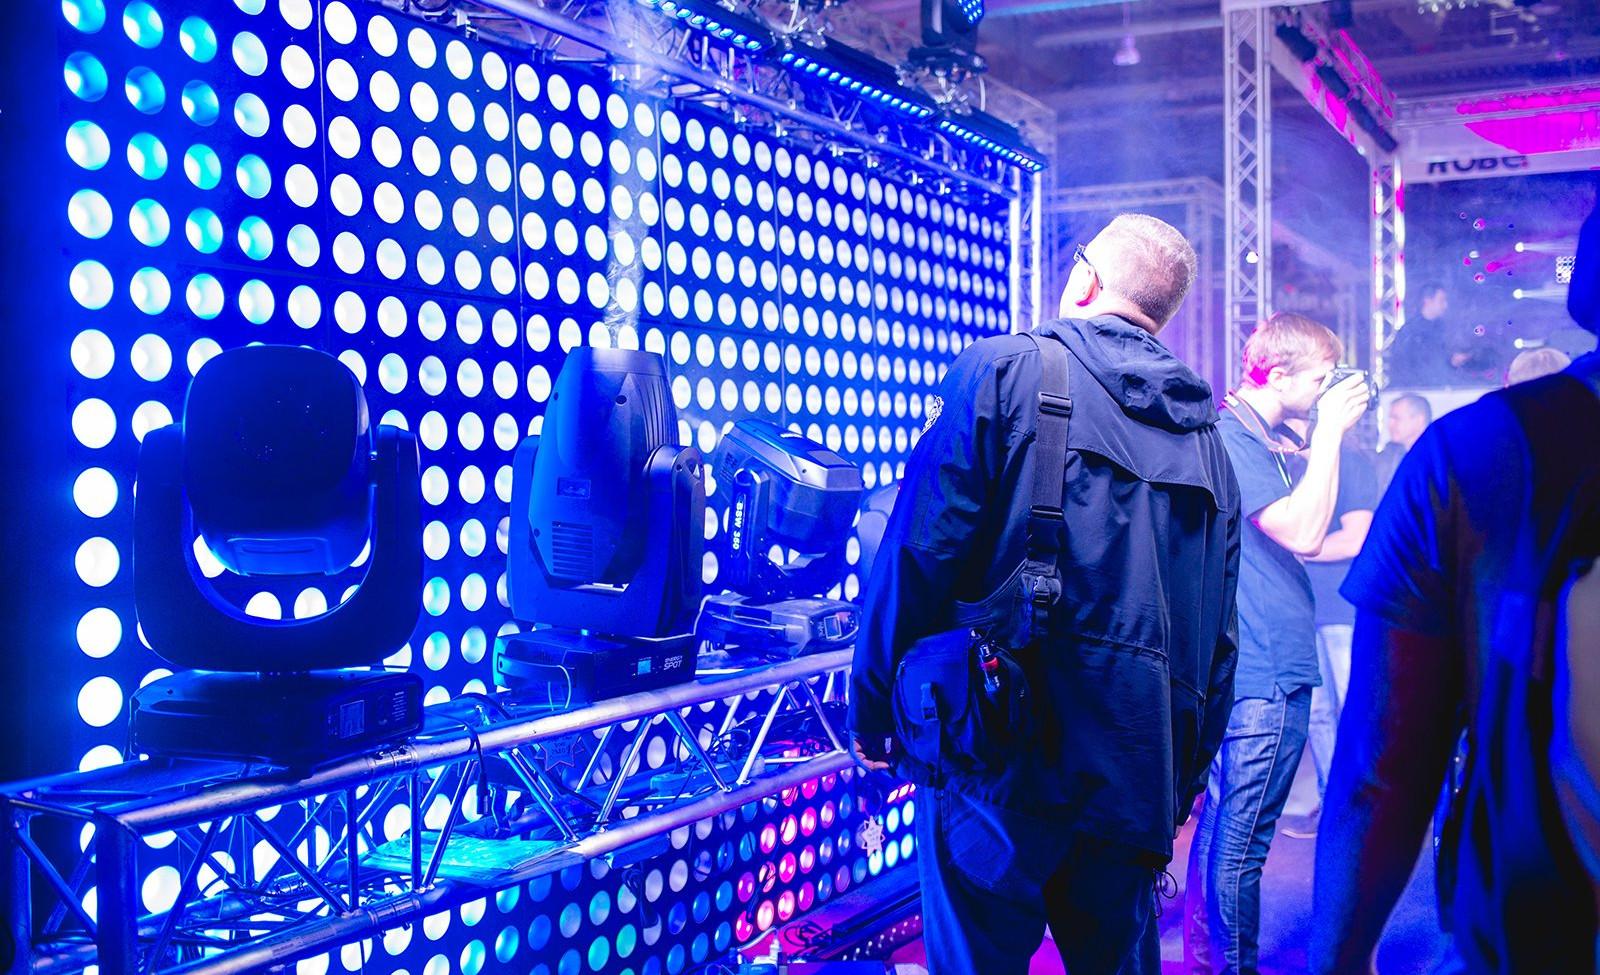 namm-musikmesse-and-prolight-sound-namm-